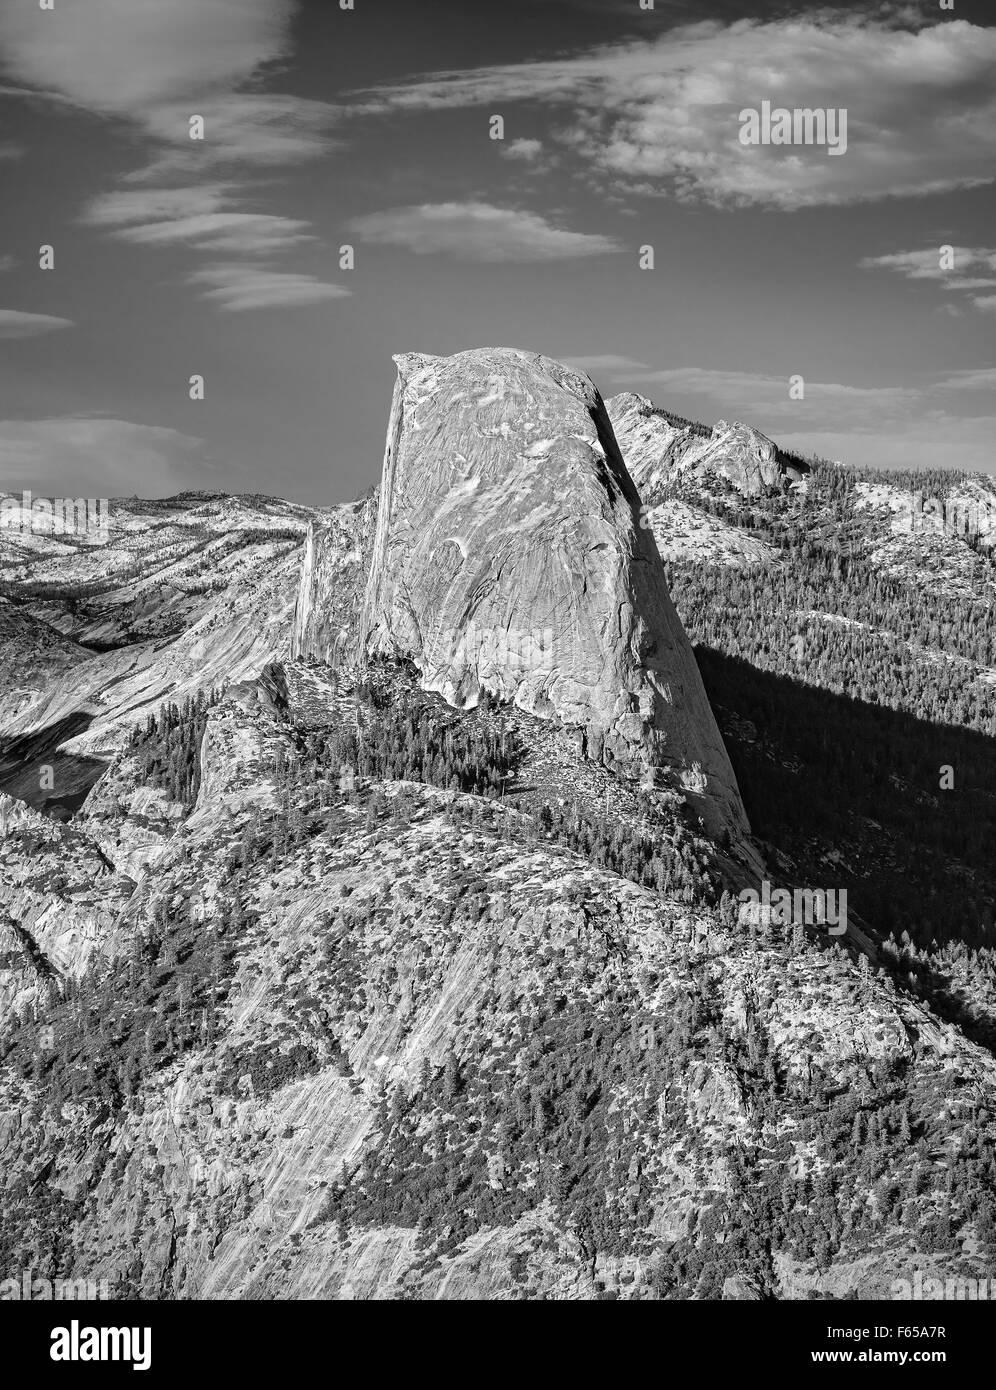 Schwarz / weiß Half Dome Felsformation, berühmten Felsen Kletterer Ziel, Yosemite-Nationalpark, USA. Stockbild